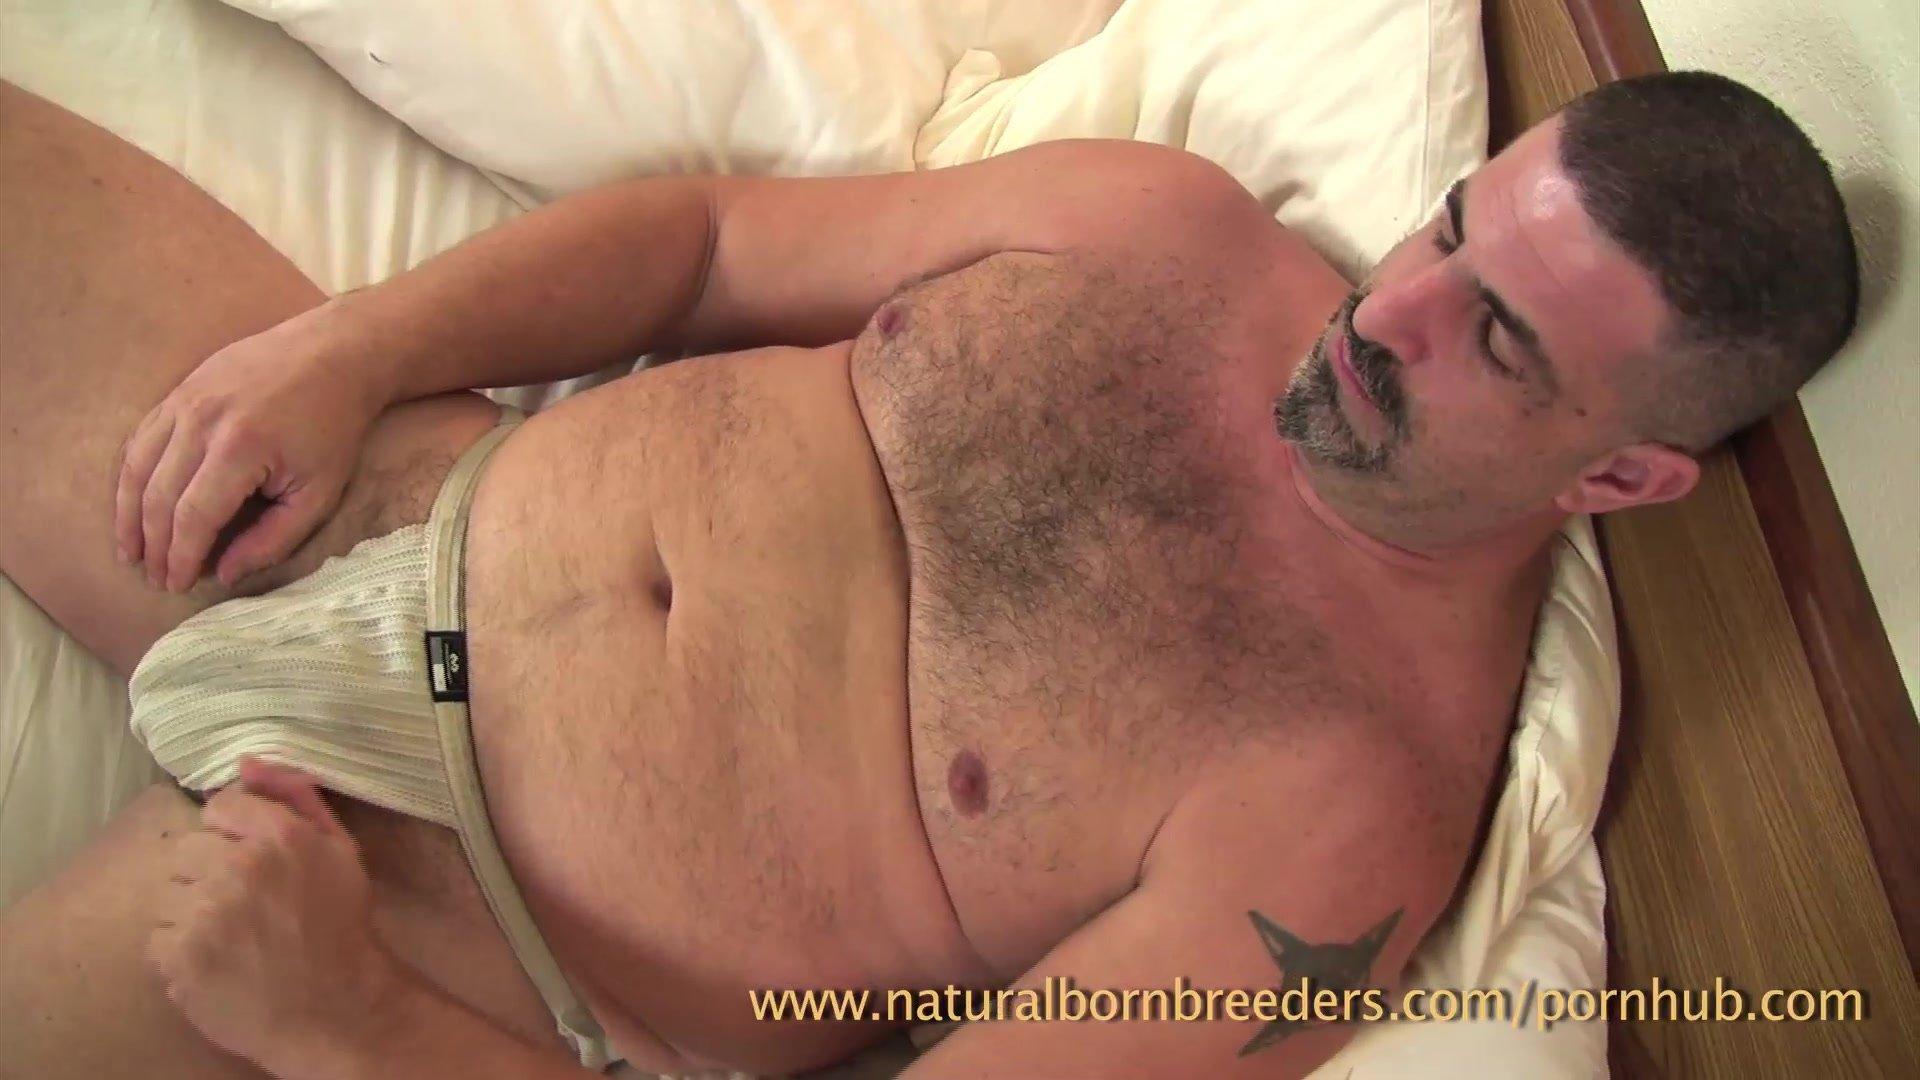 Naturalbornbreeders/jack off/his jon woof strap his